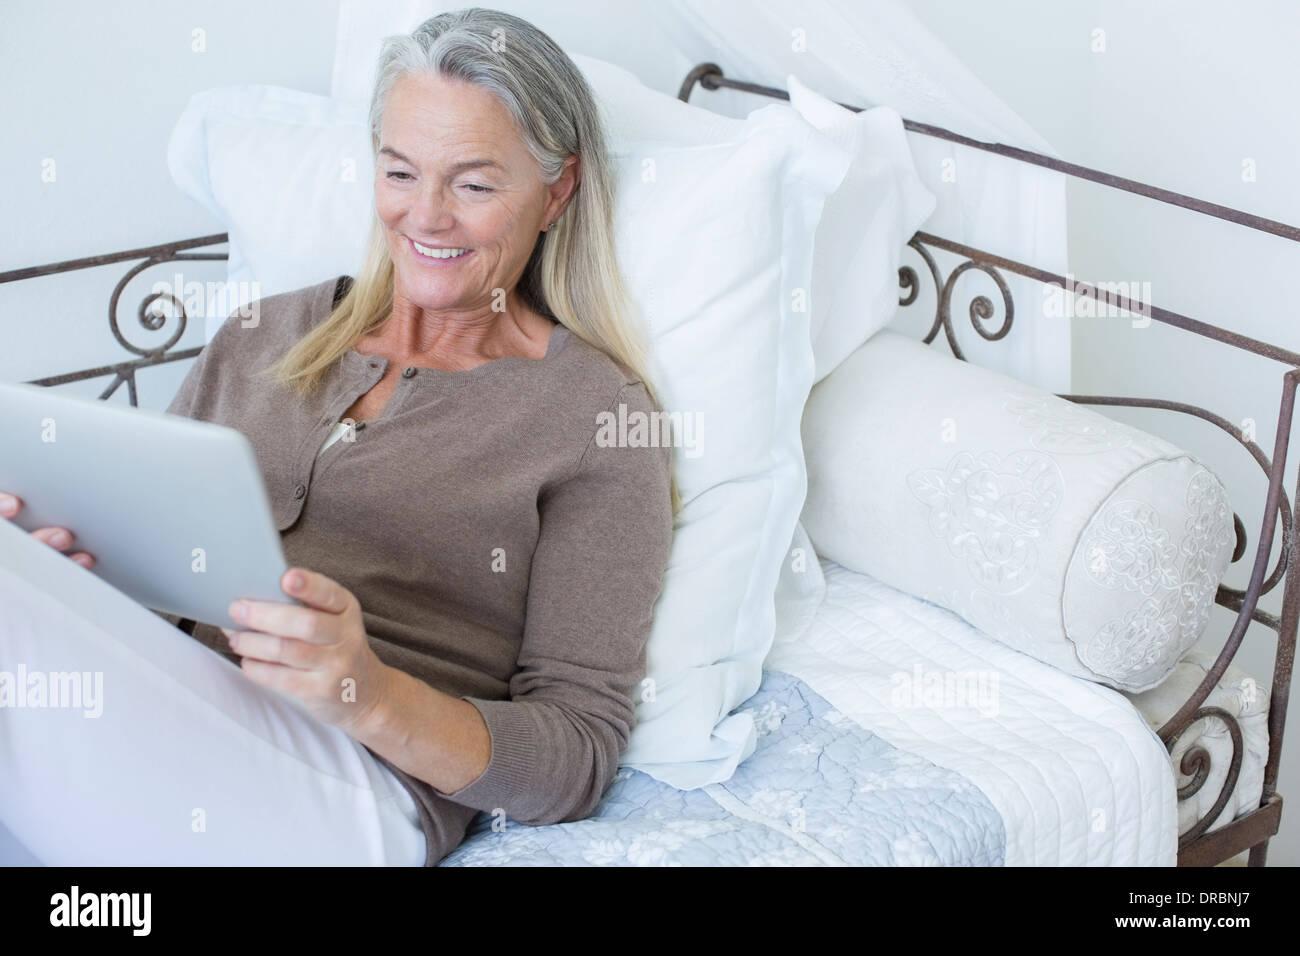 Senior woman using digital tablet on bed - Stock Image